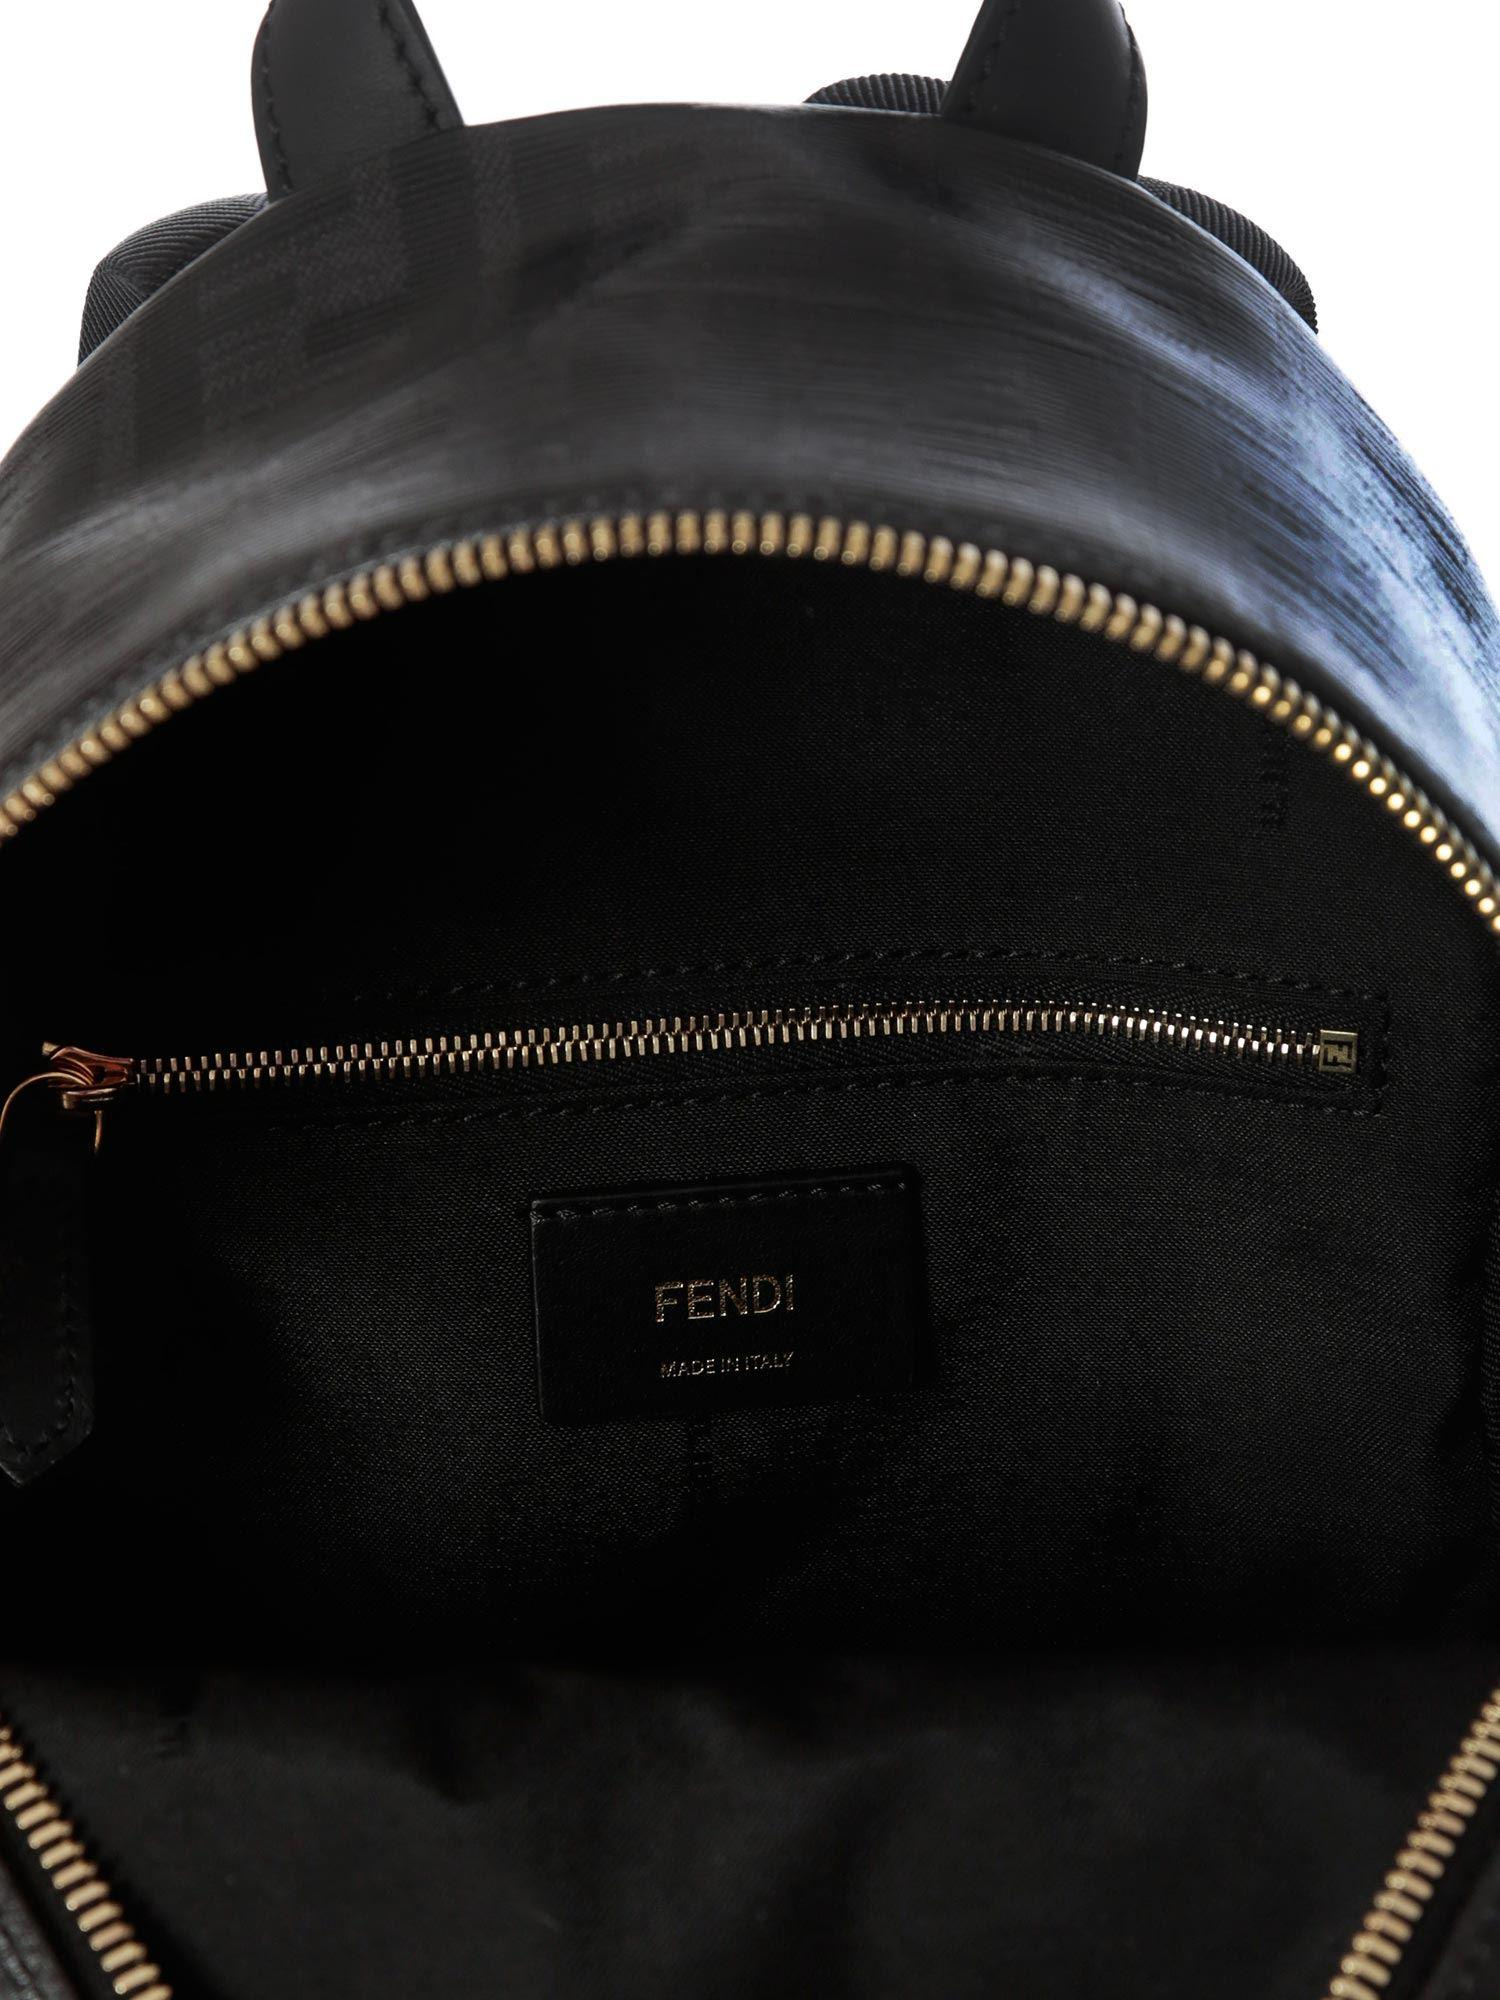 288523288e50 Fendi - Black Mania Mini Backpack - Lyst. View fullscreen